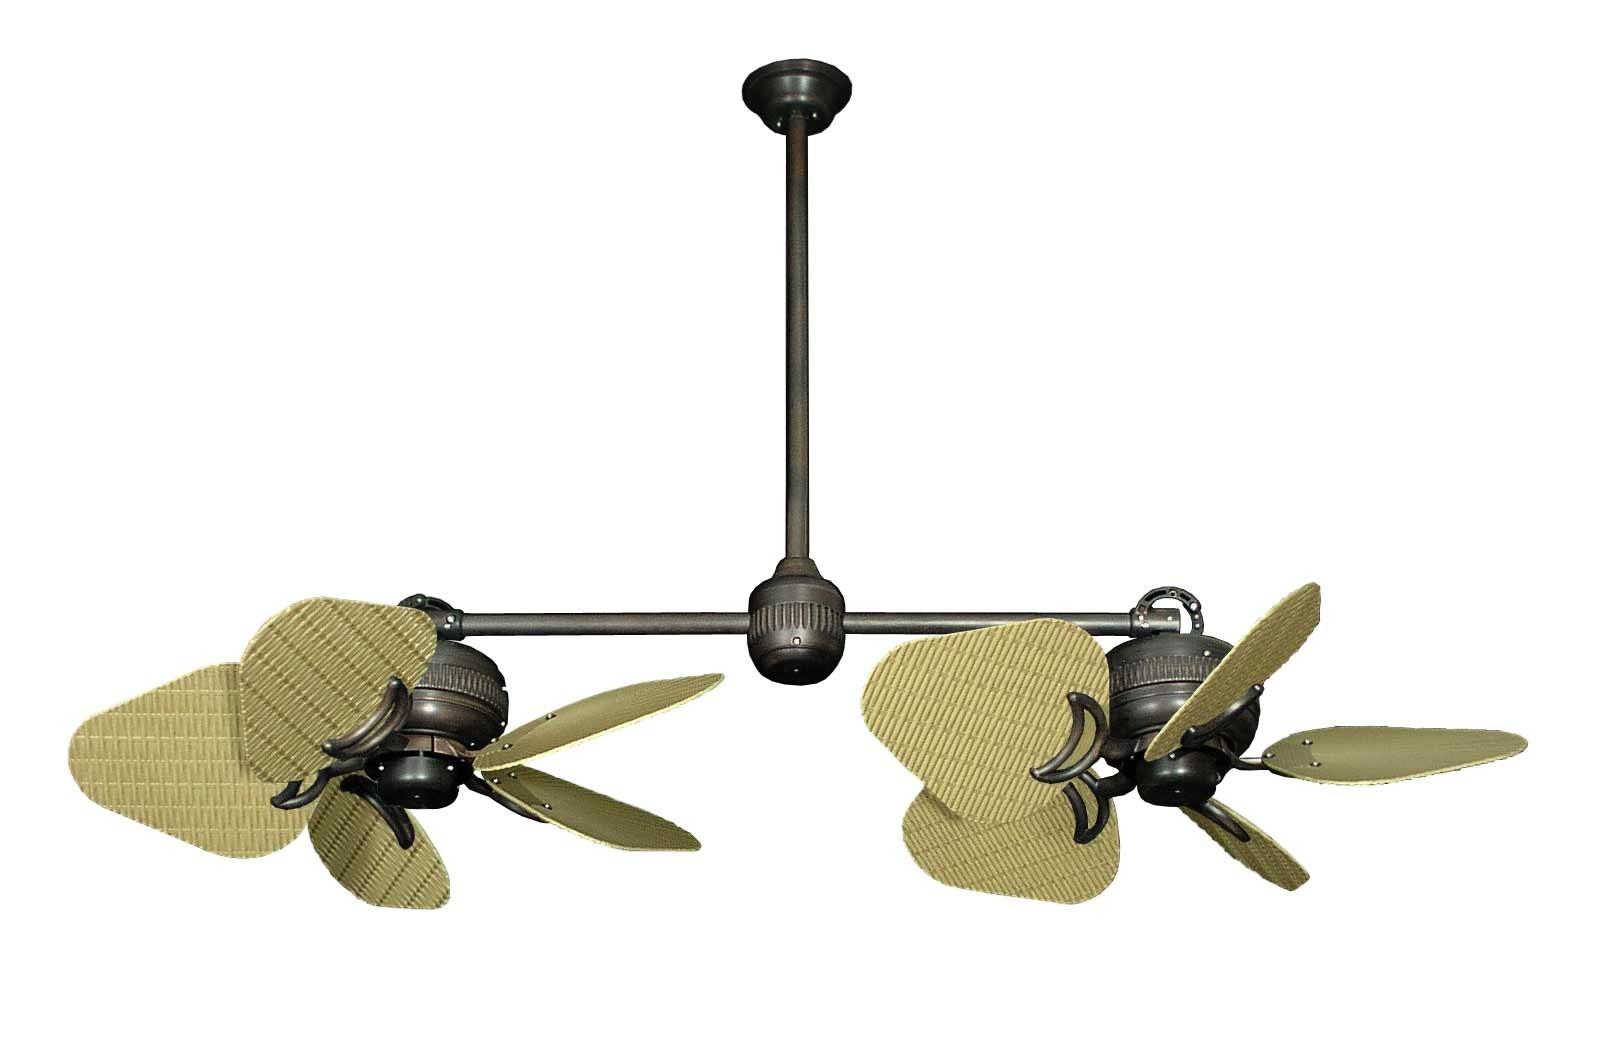 Current Leaf Blades Outdoor Ceiling Fans For Dans Fan City Miami Twin Star Ii Double Ceiling Fan Abs Wicker/leaf (View 12 of 20)